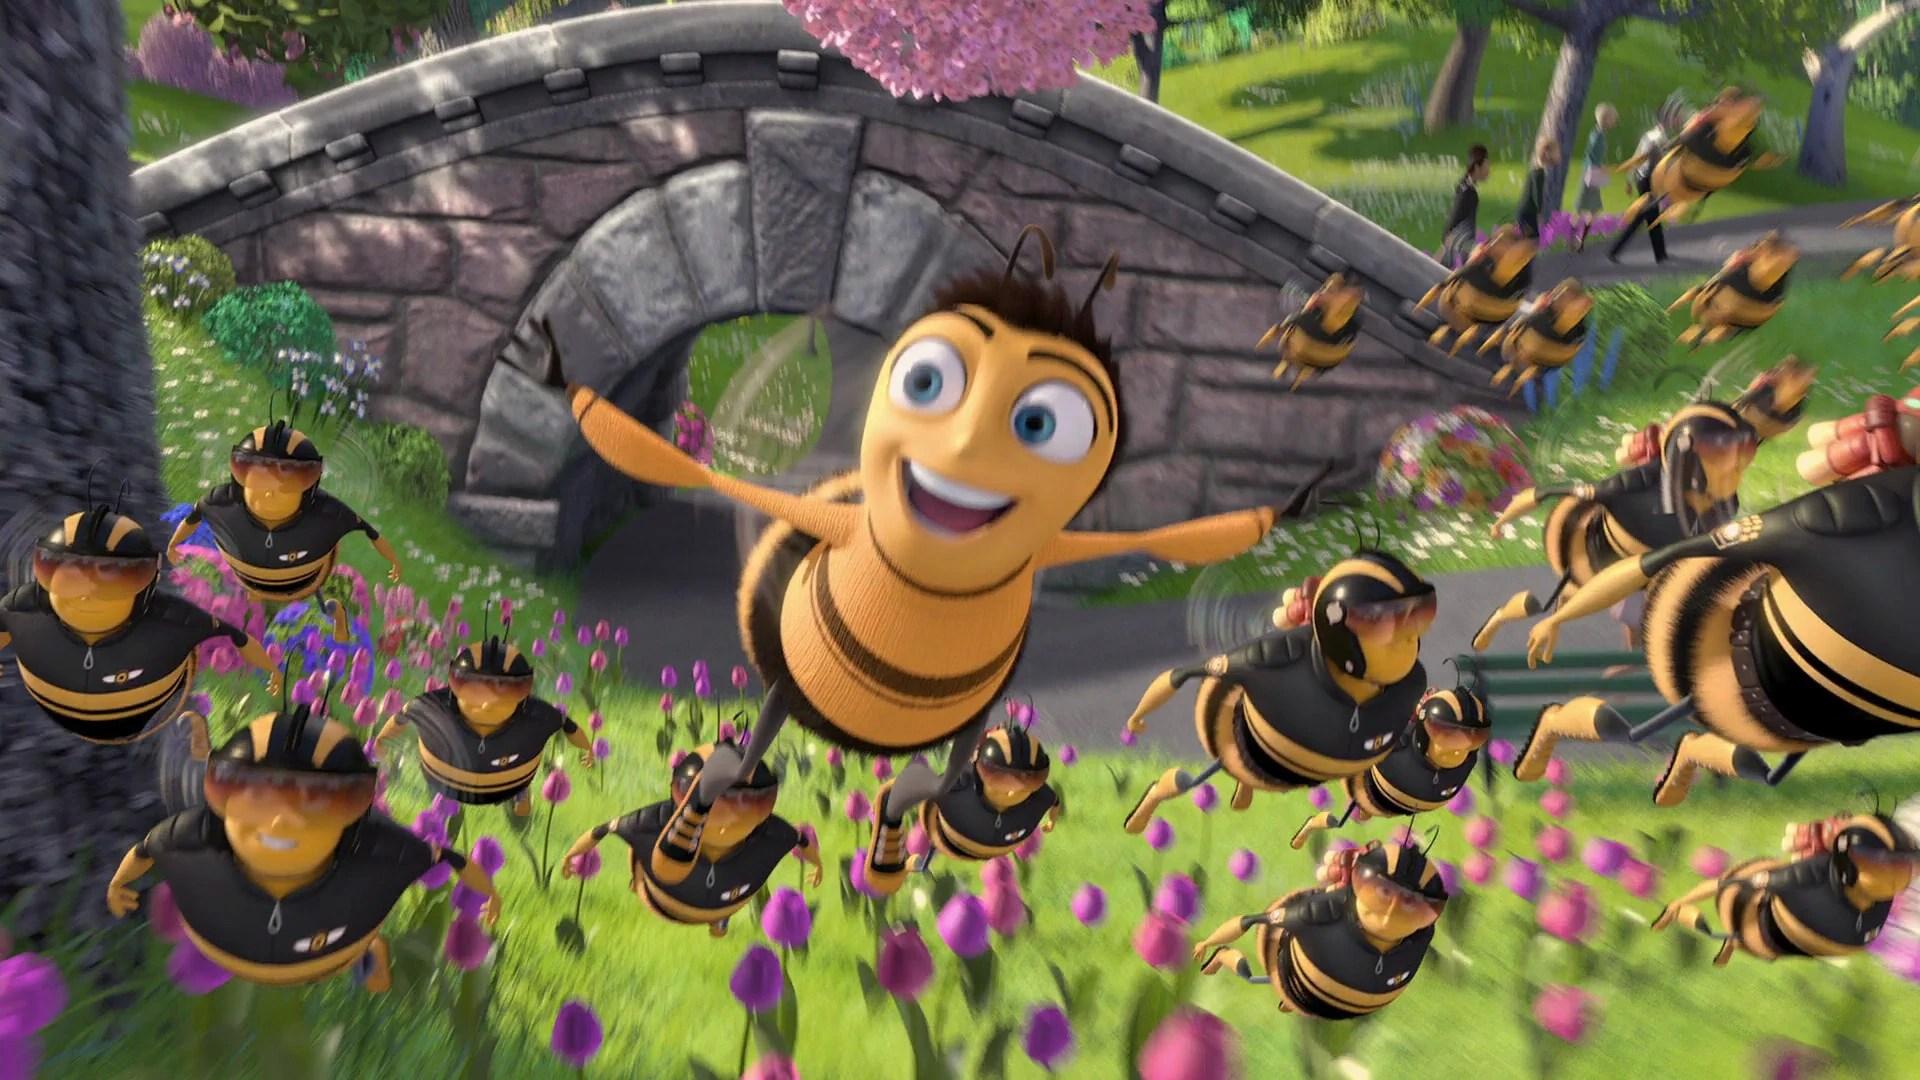 Cute Bees Wallpaper Image Bee Movie Disneyscreencaps Com 1710 Jpg